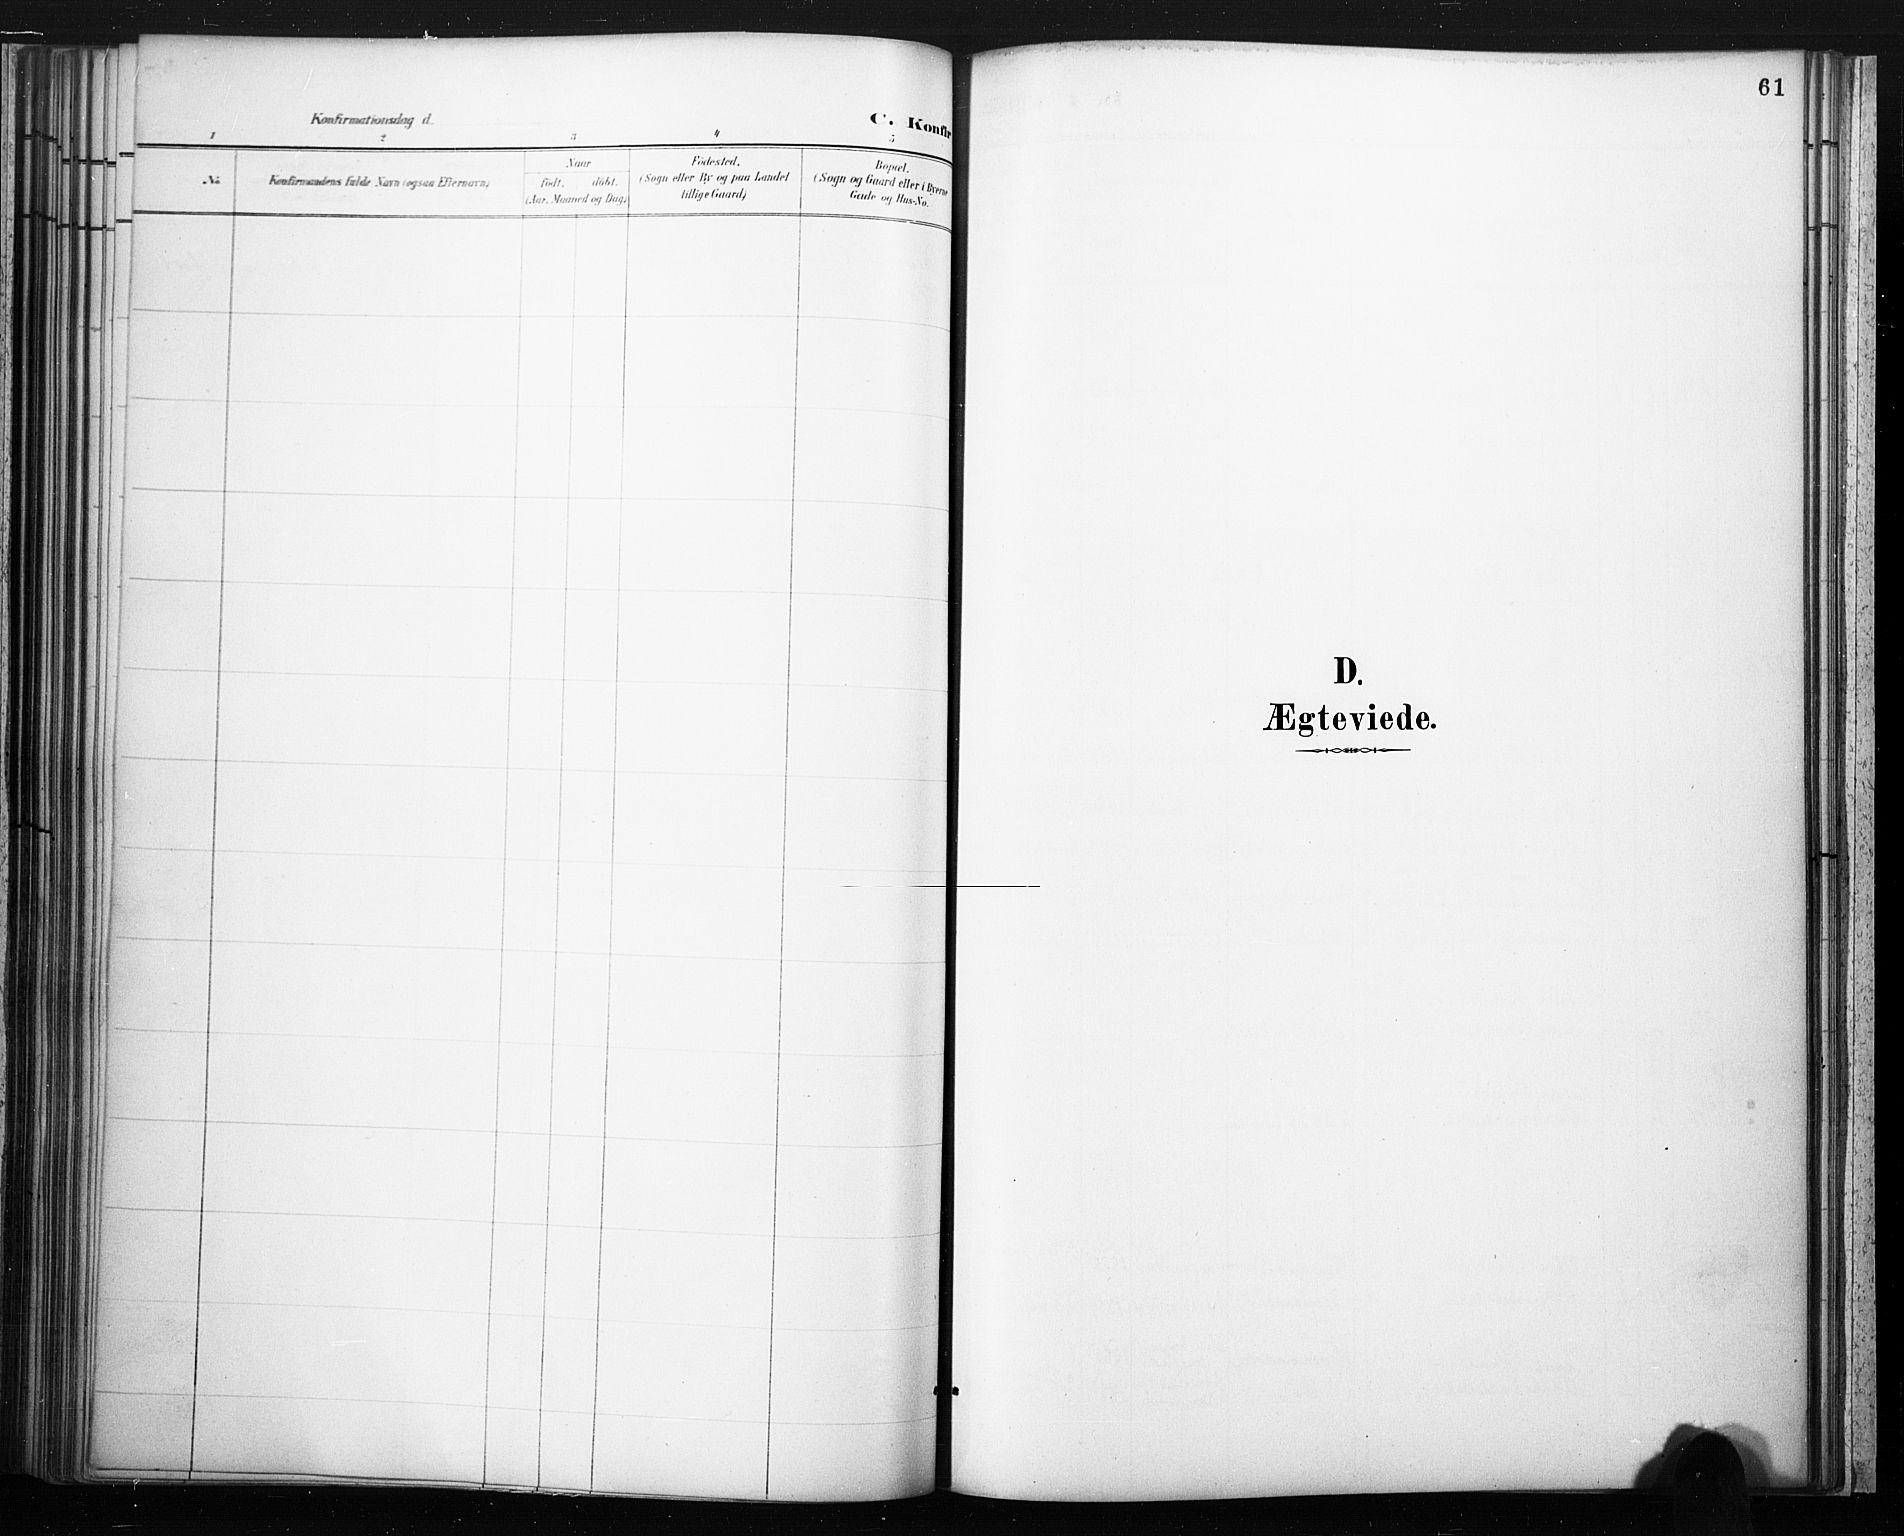 SAKO, Lårdal kirkebøker, F/Fc/L0002: Ministerialbok nr. III 2, 1887-1906, s. 61